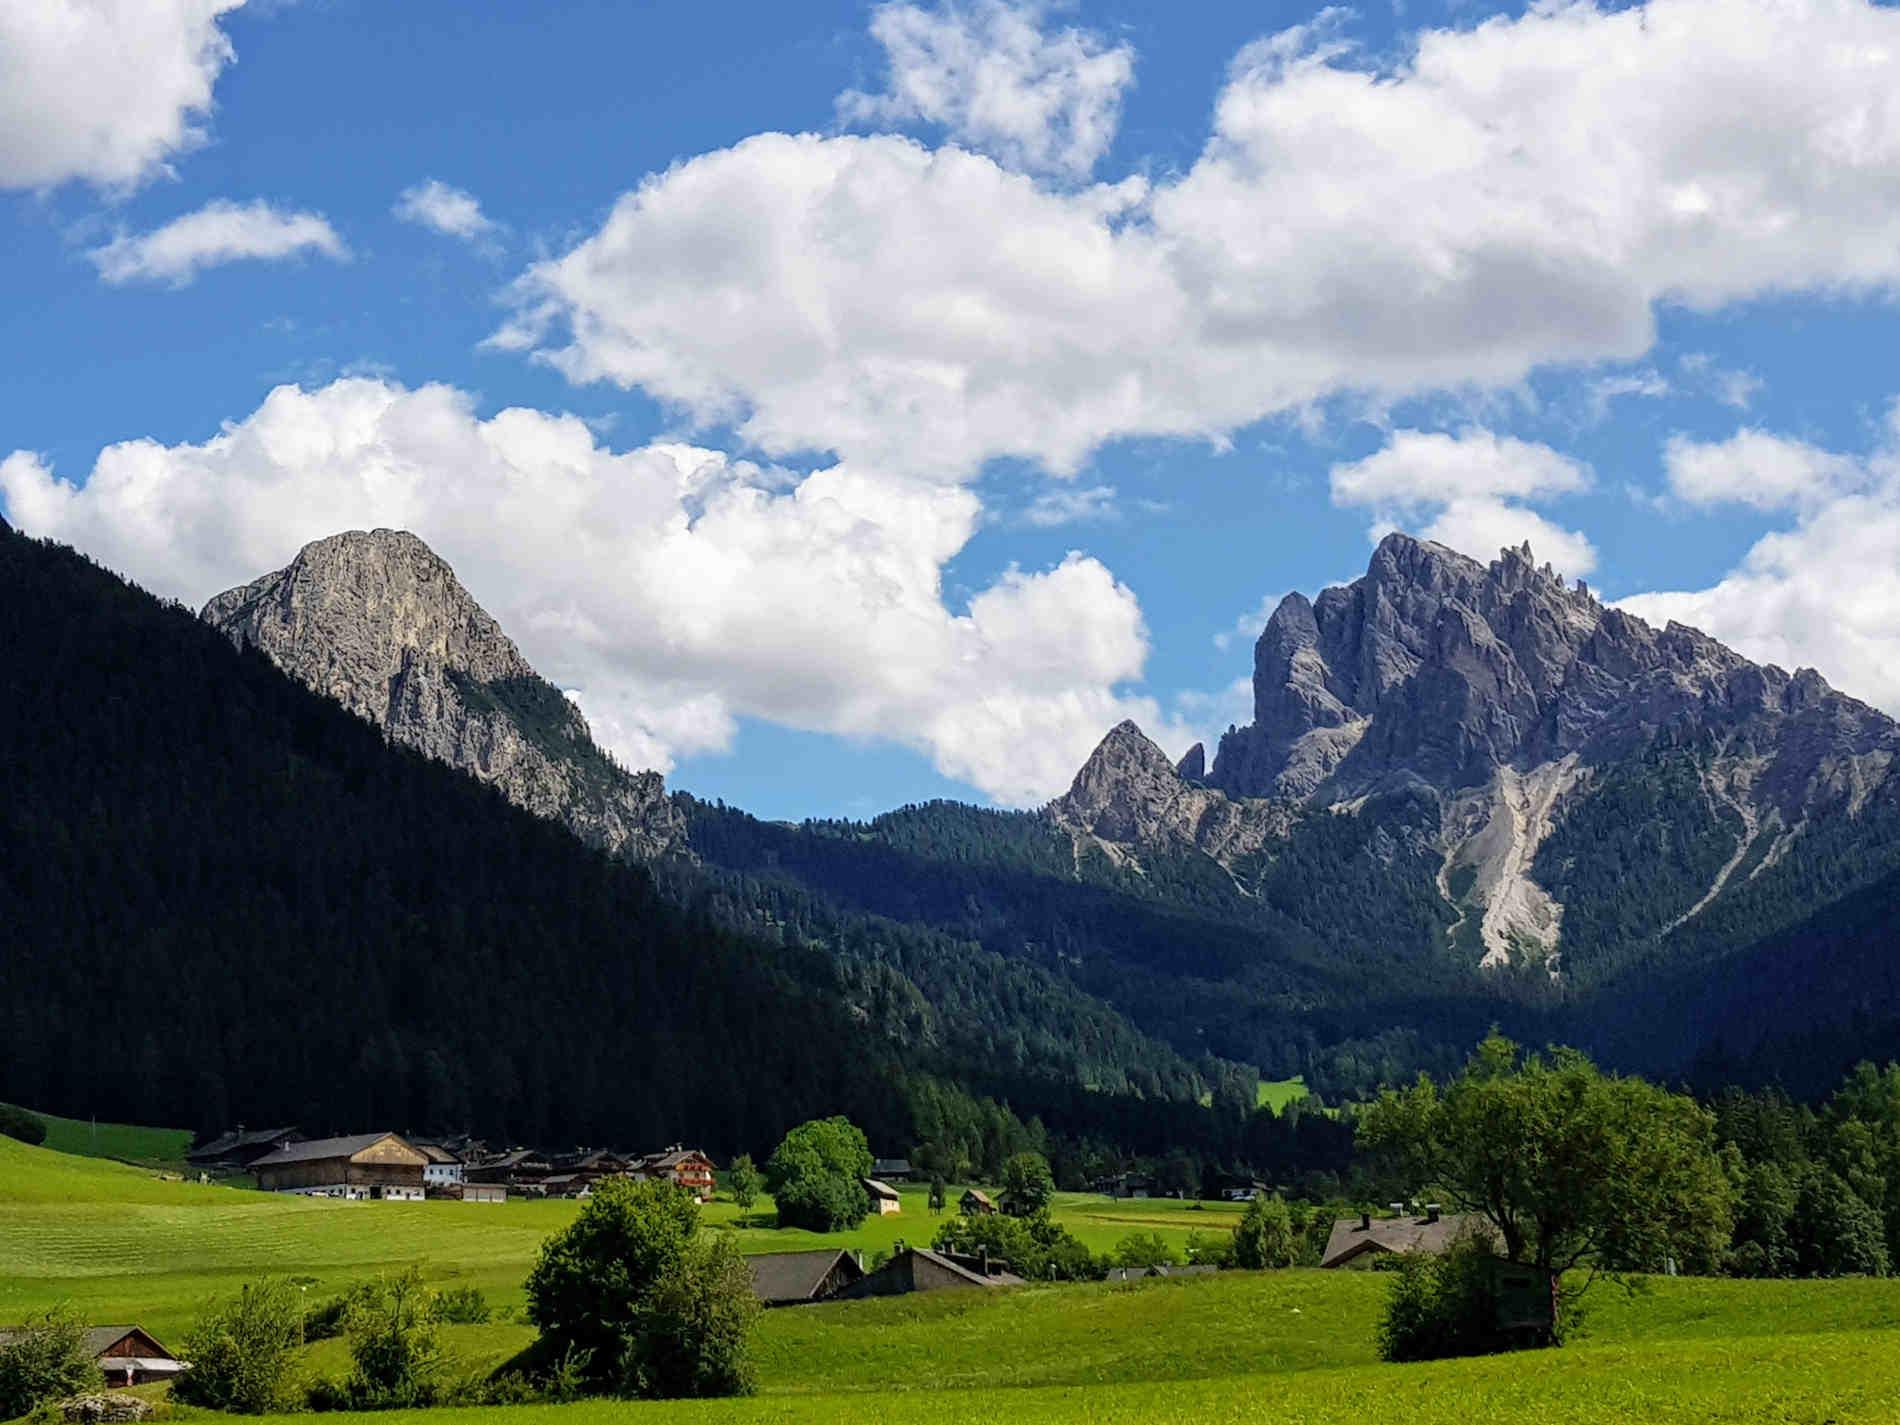 Panorami della Valle di Braies in Val Pusteria